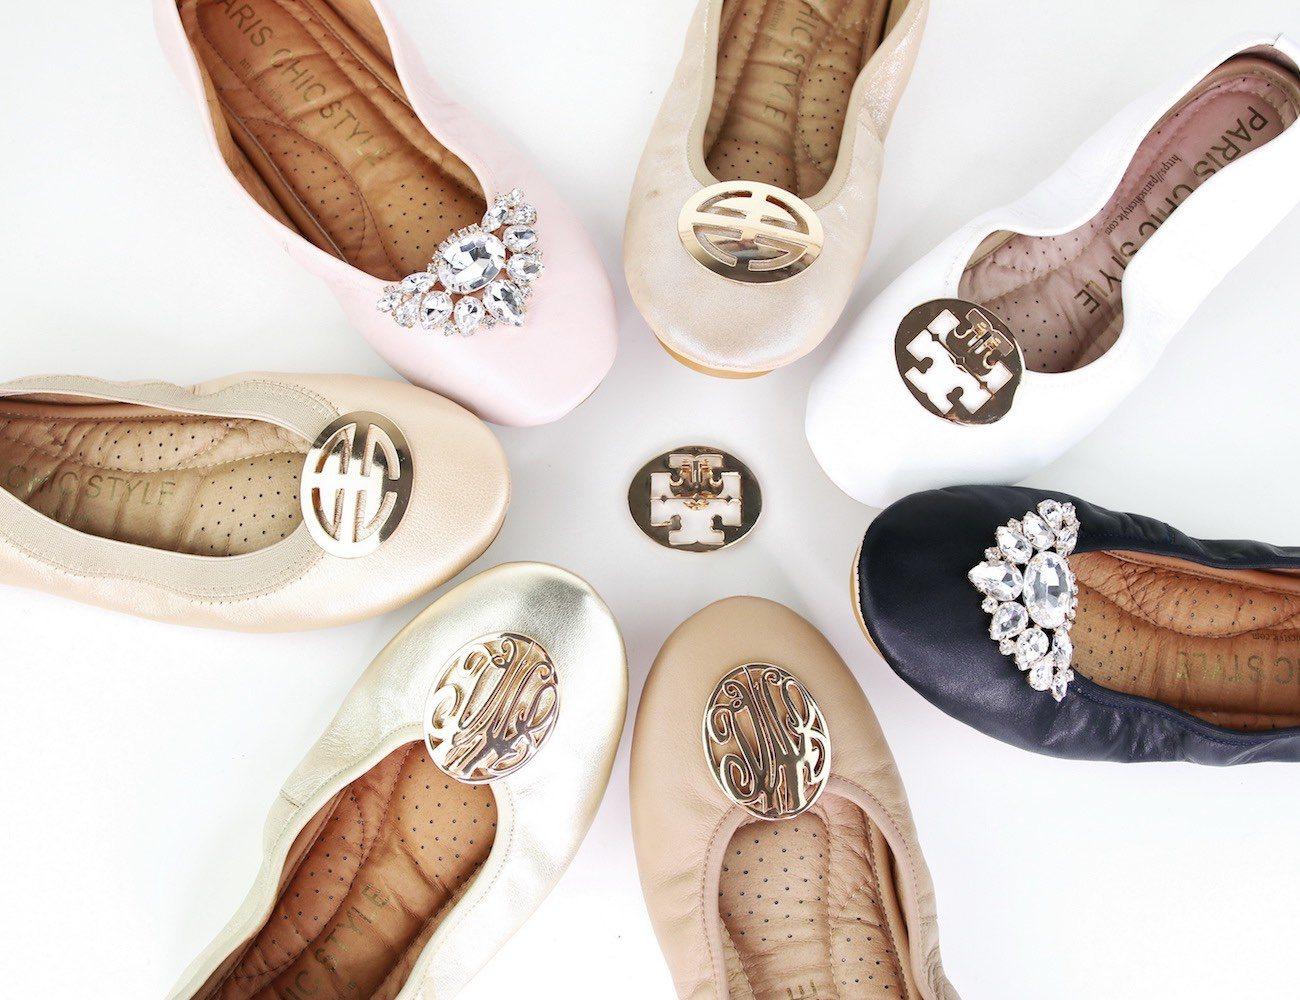 Most Comfortable & Stylish Foldable Ballet Flats